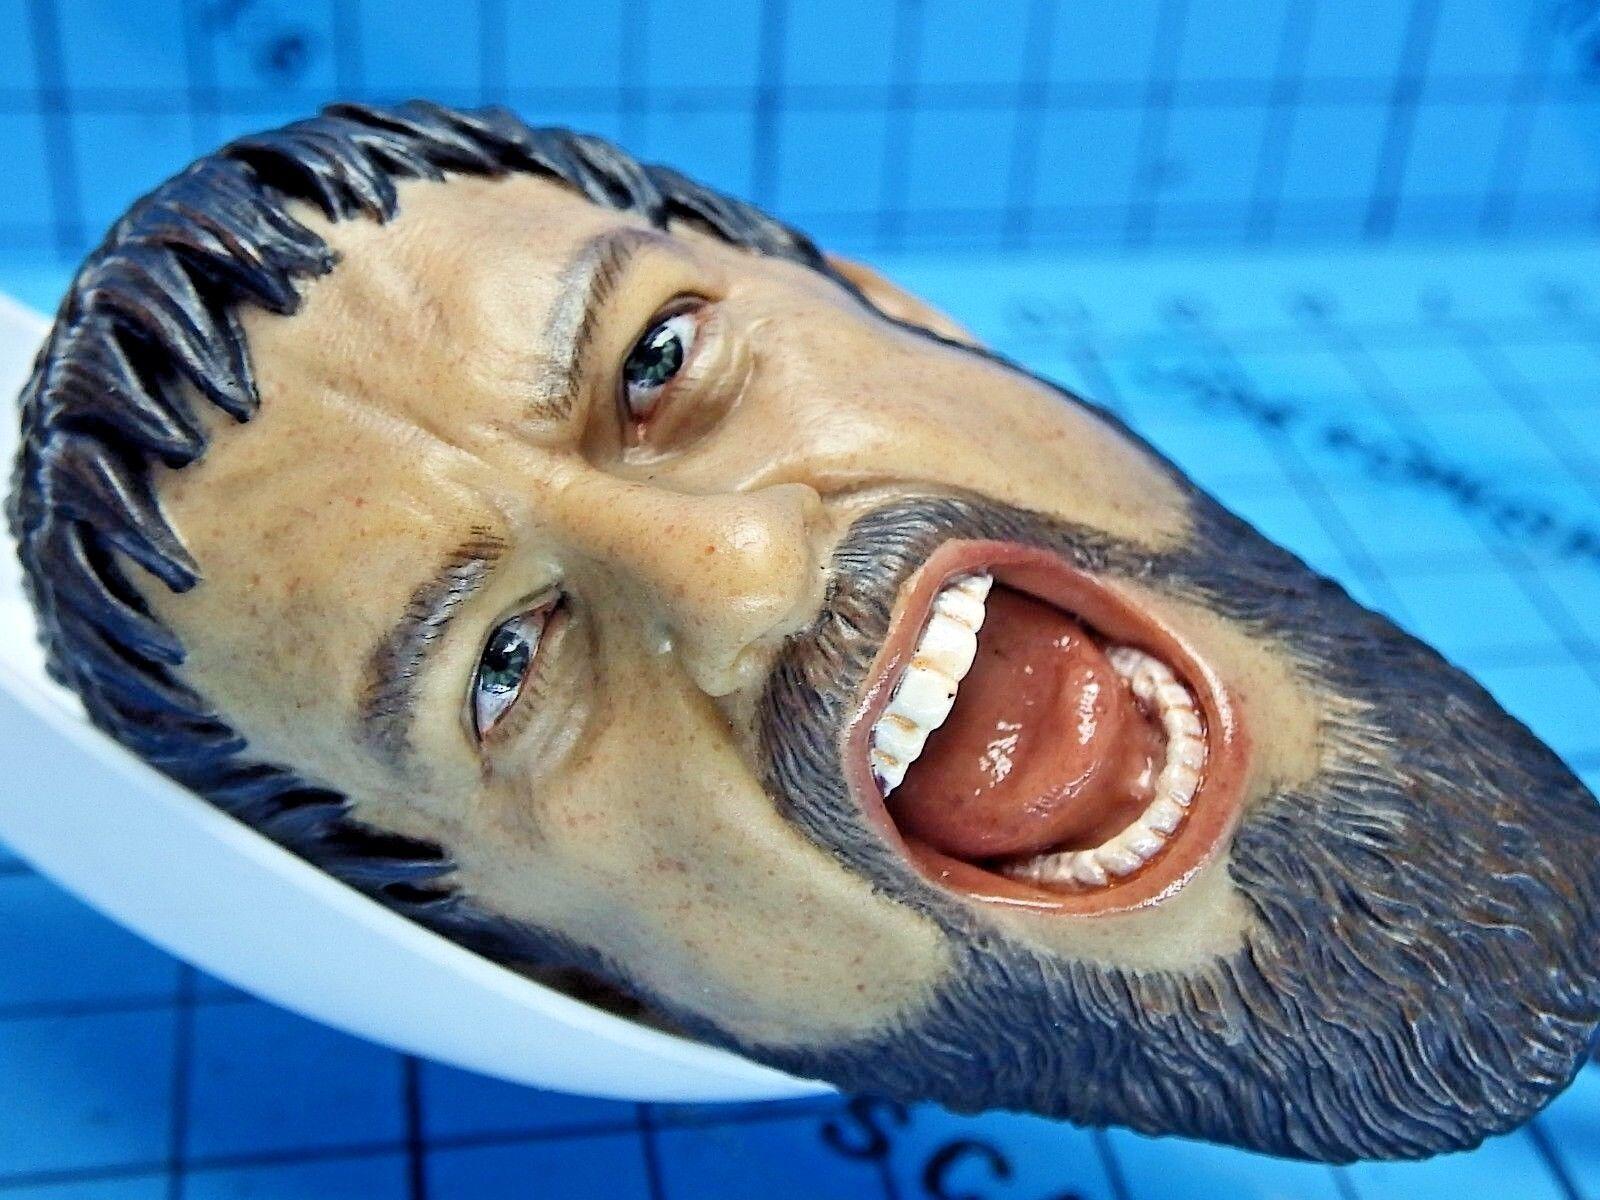 Star Ace Toys 1 6 SA0030 King Leonidas 300 Figure - Fierce Ponytail Head Sculpt